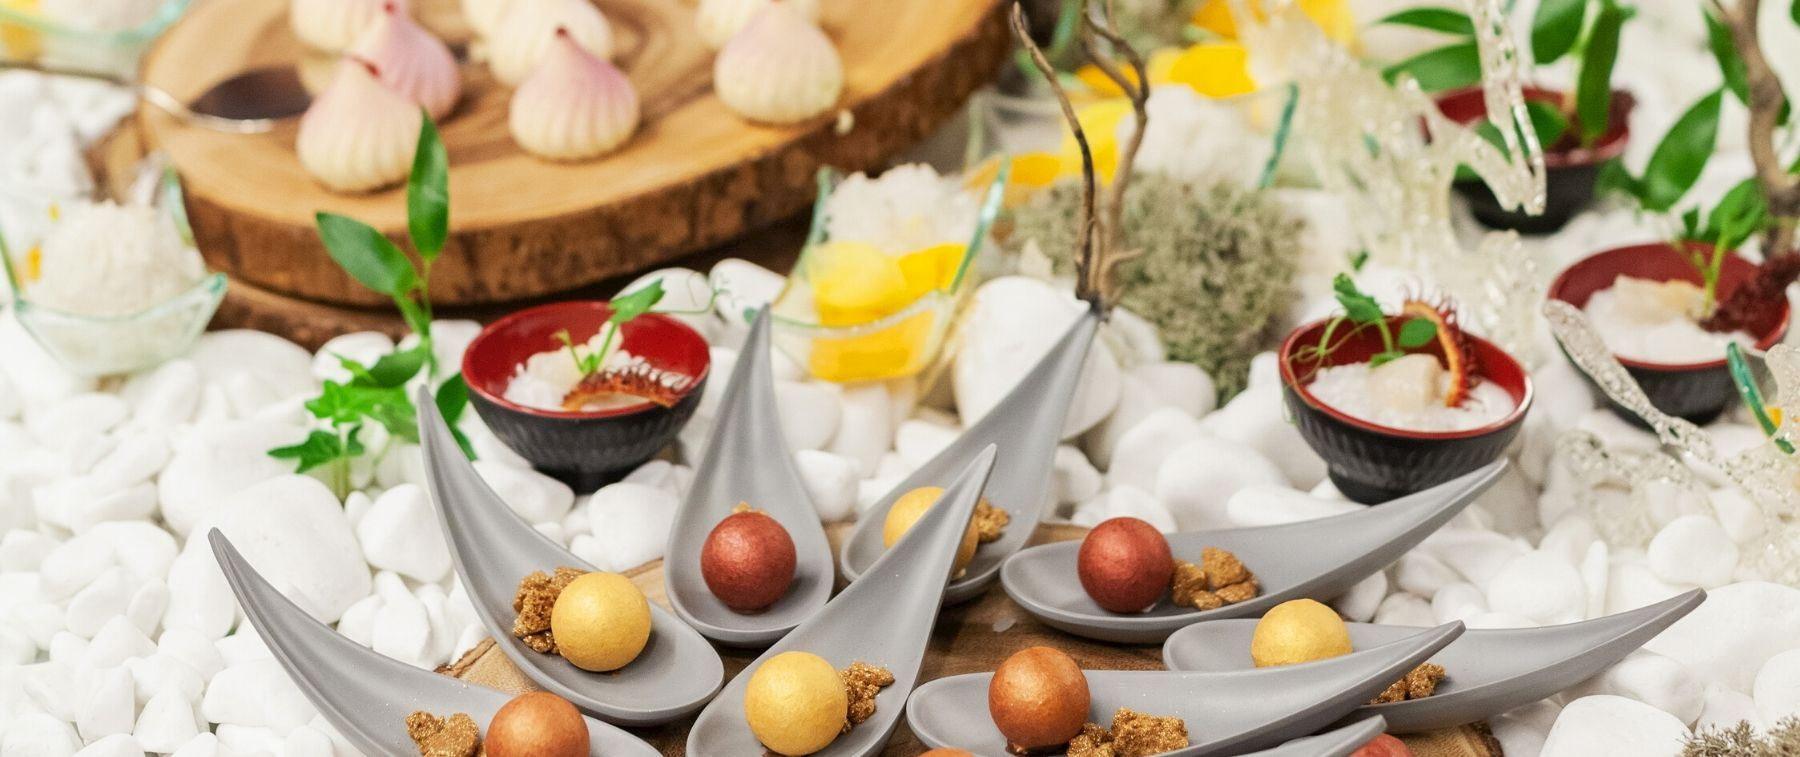 Sheraton Catering Facilities